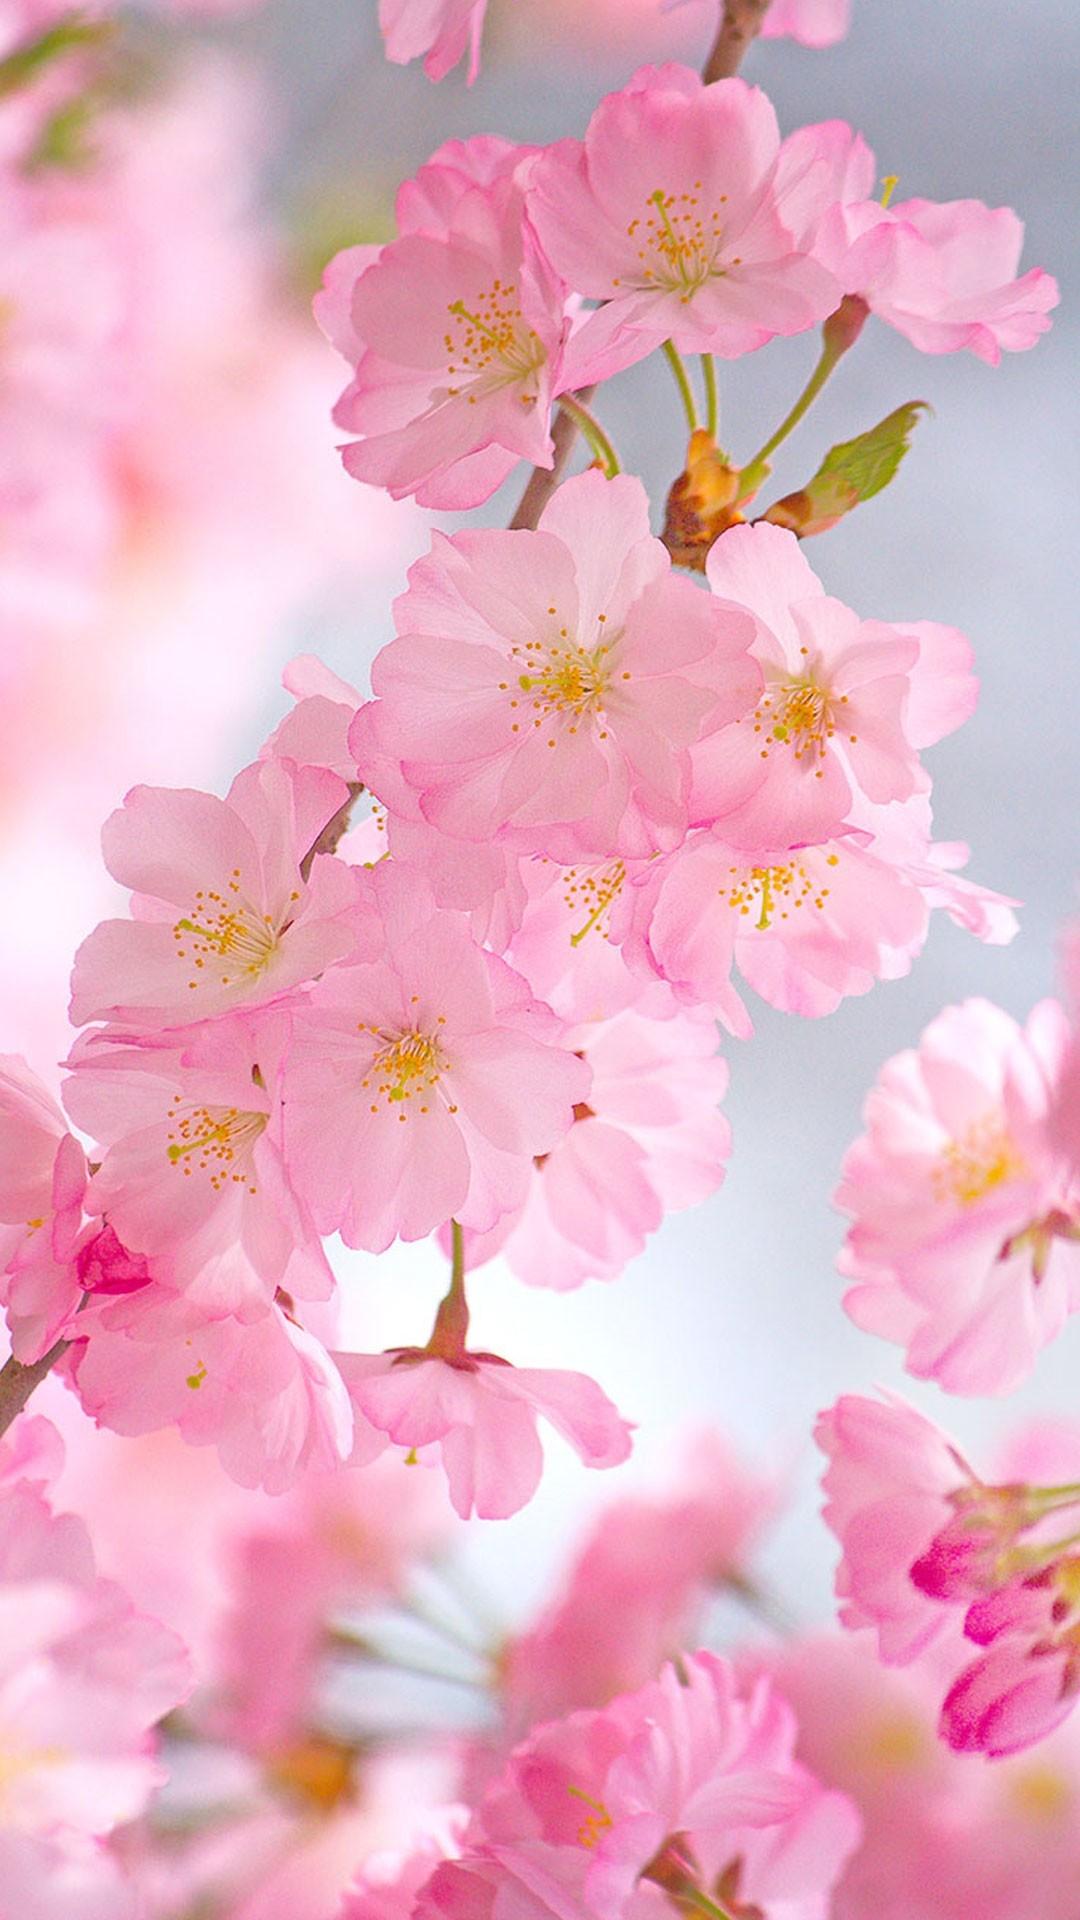 Cherry Blossom iphone 8 wallpaper